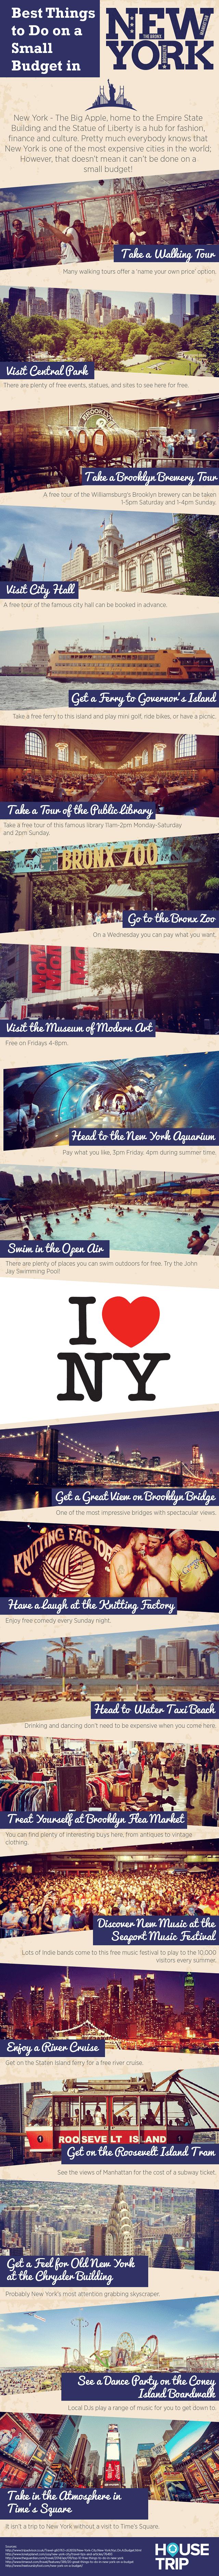 New York infographic